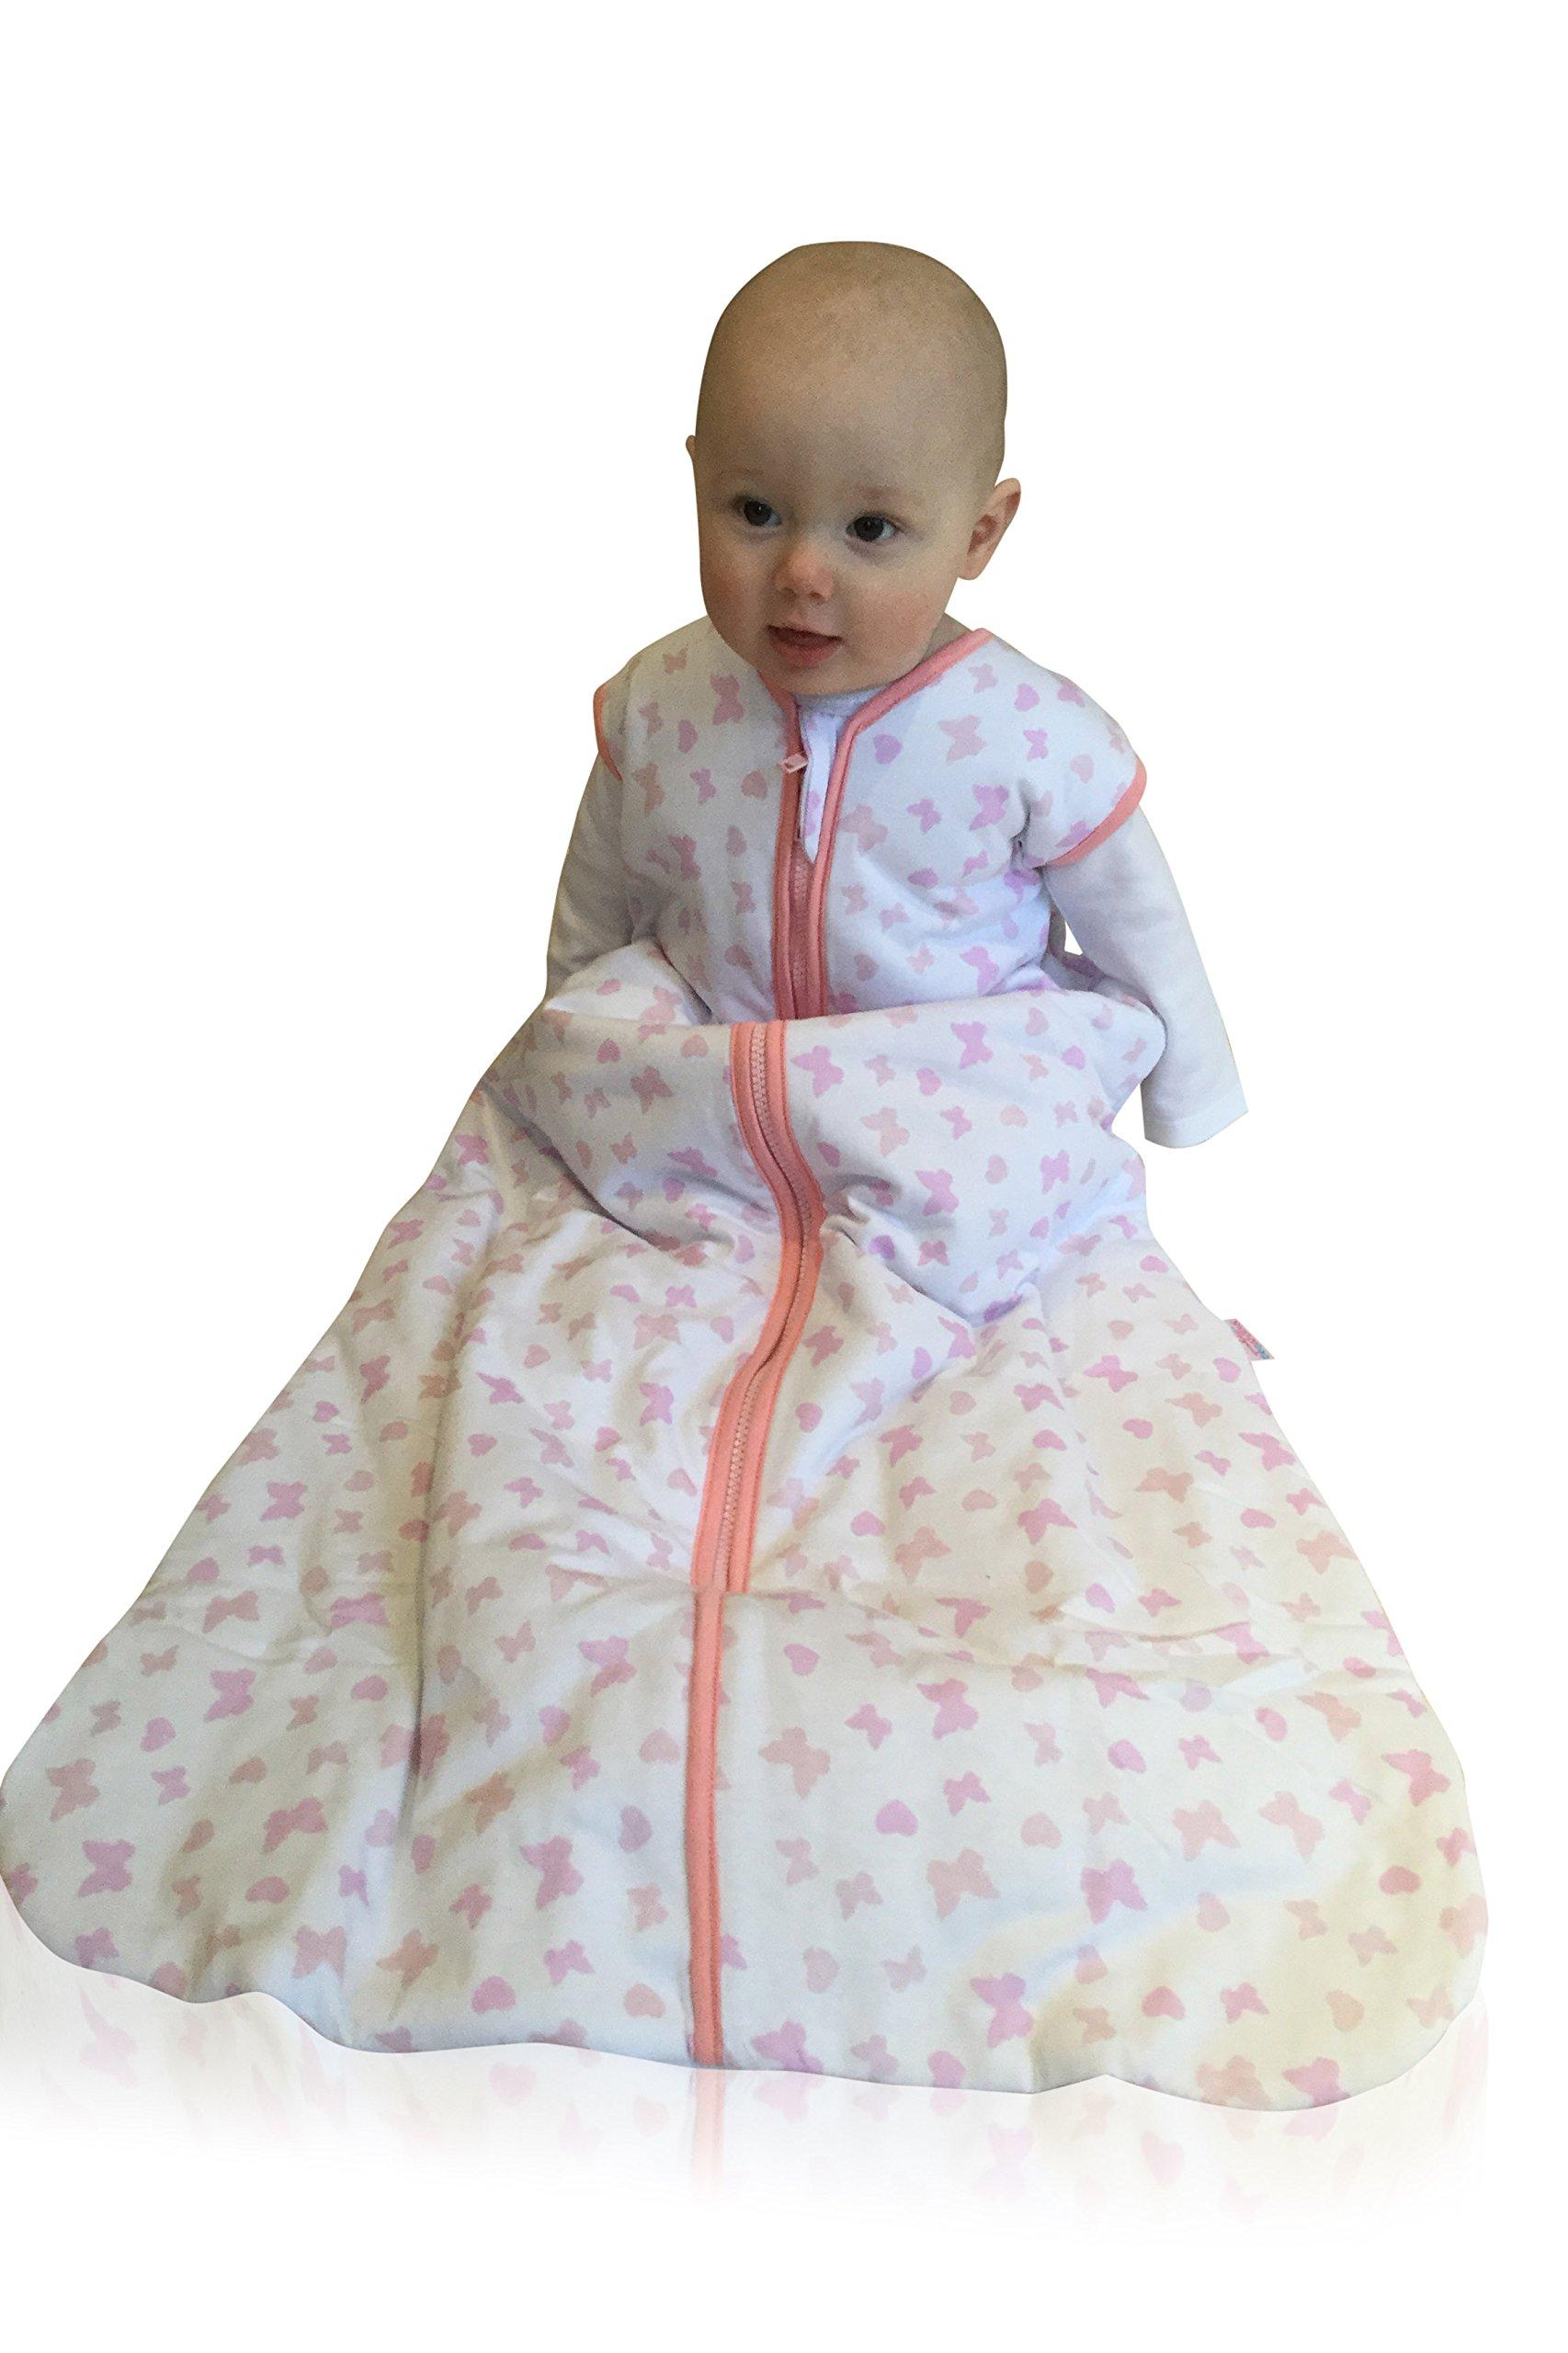 76cm Snoozebag Butterflies and Hearts 100/% Cotton Girls Summer 1.0 Tog Nursery Baby Sleeping Bag Pink 0-6 Months